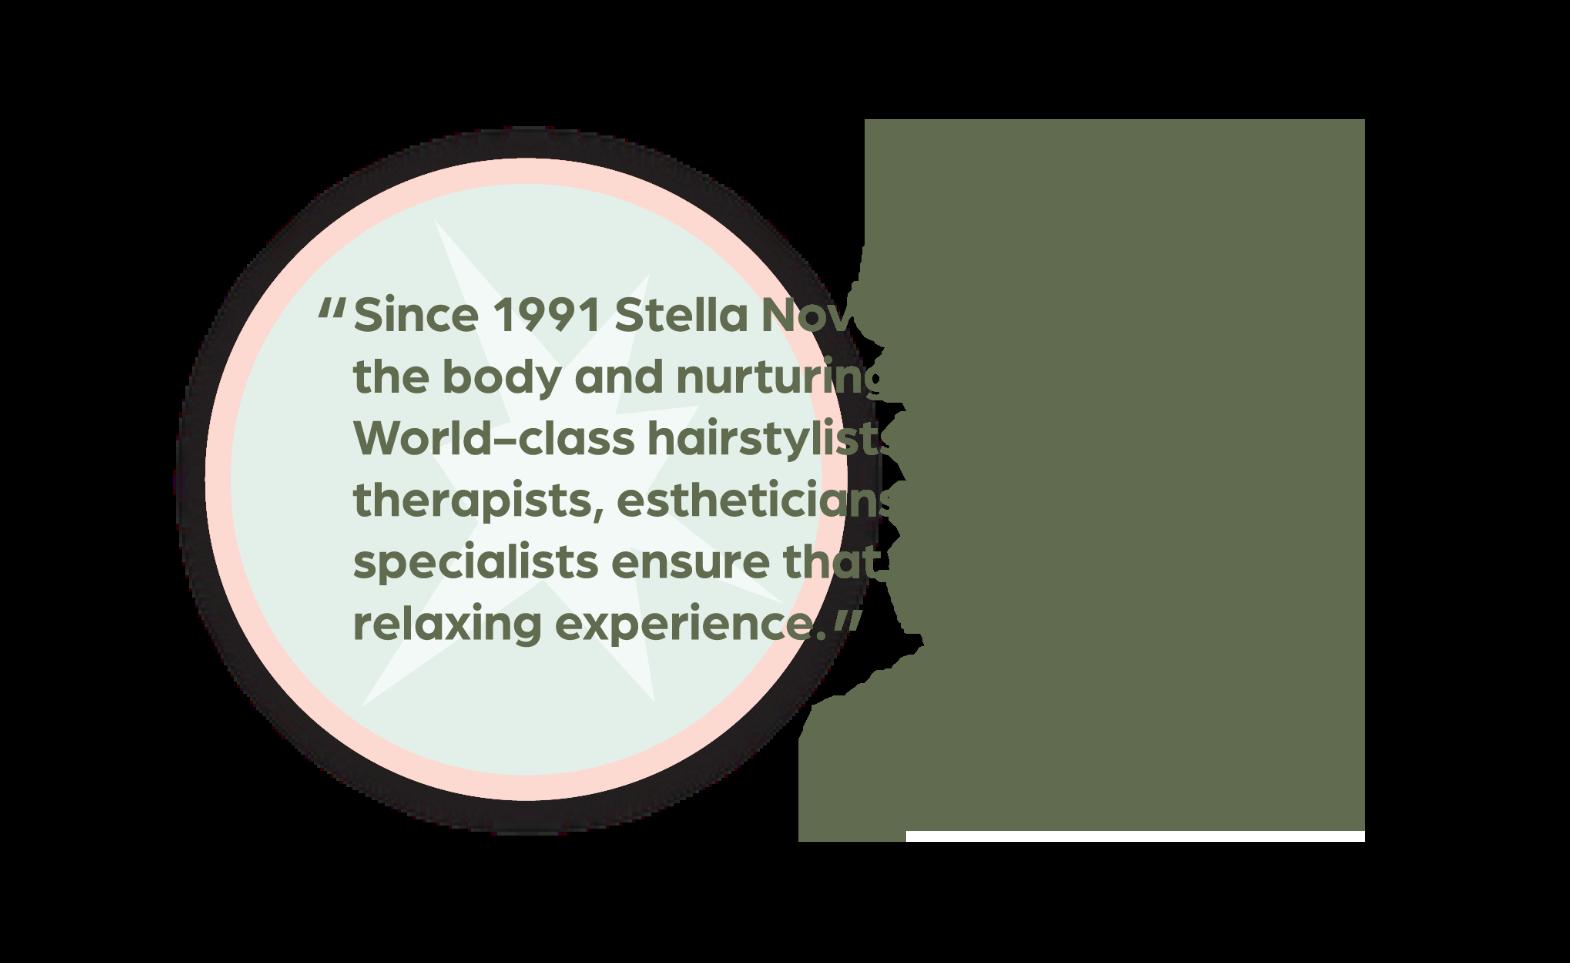 Stella Nova Salon Charleston South Carolina Quote Home Page.png